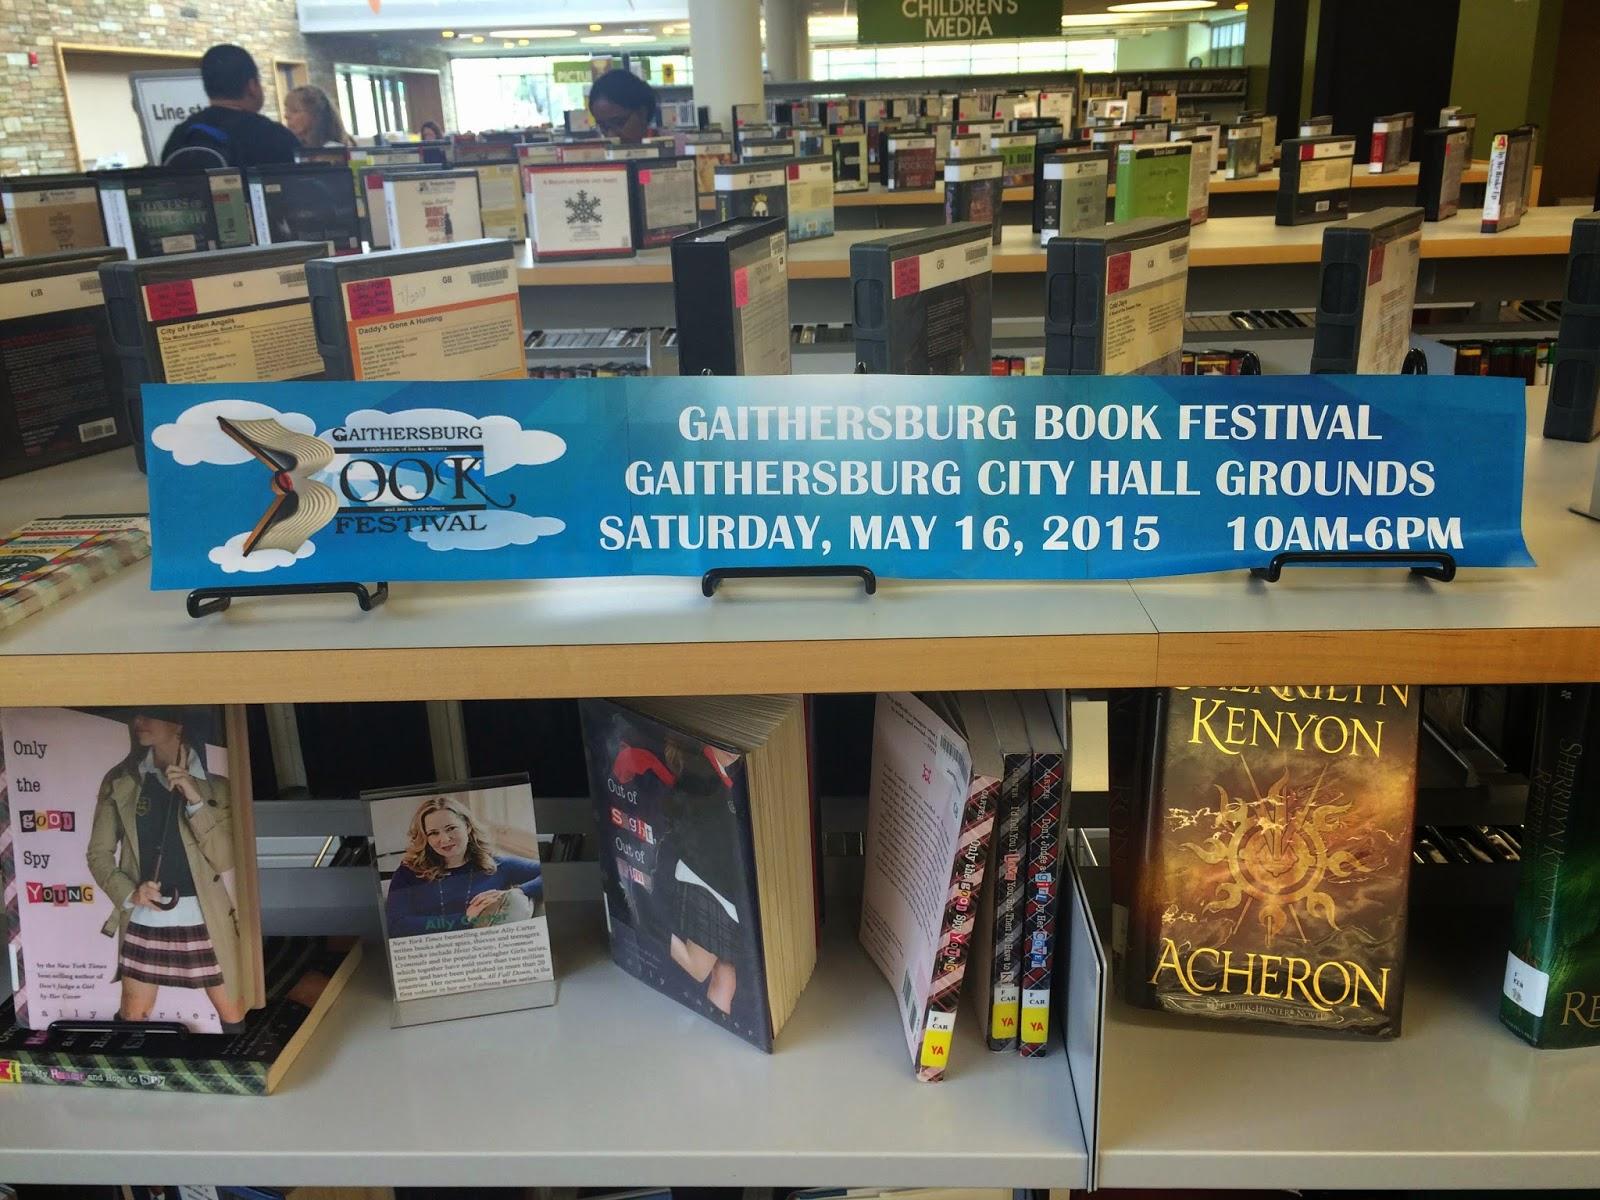 Gaithersburg Book Festival display at Gaithersburg Library